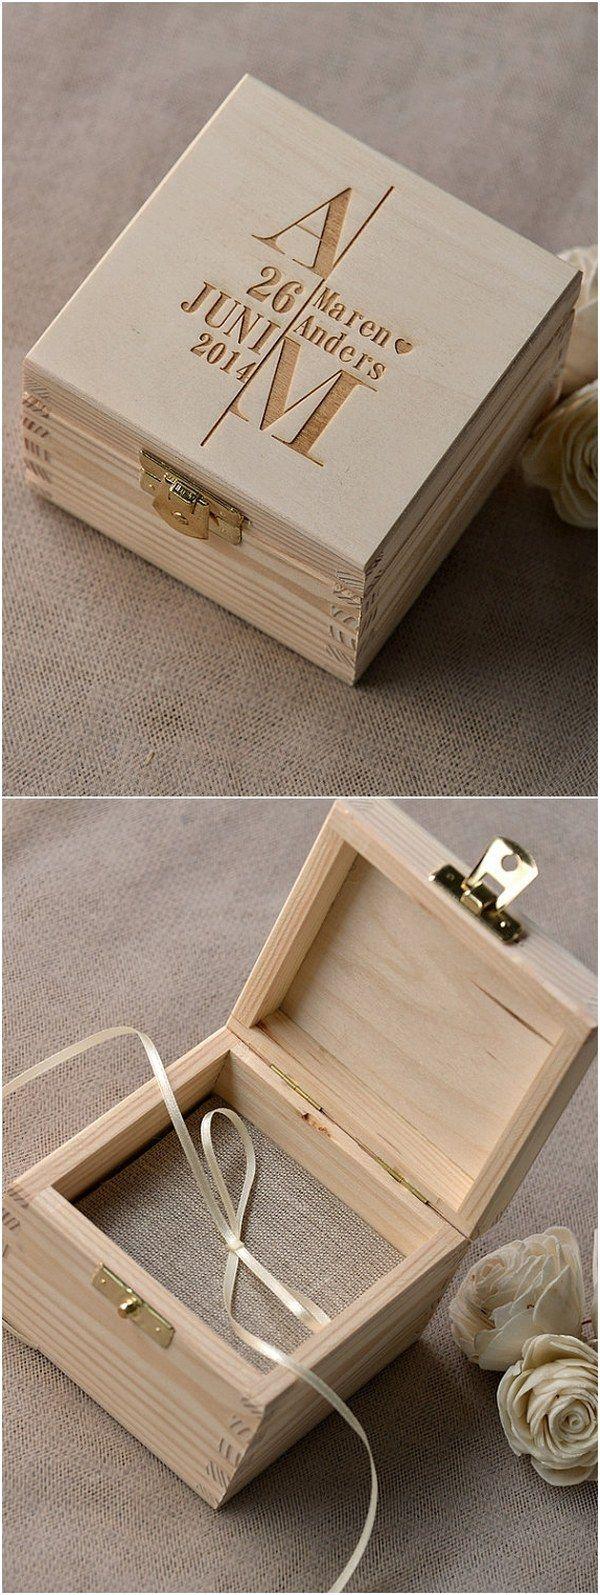 best 25+ wood wedding rings ideas on pinterest | wood wedding